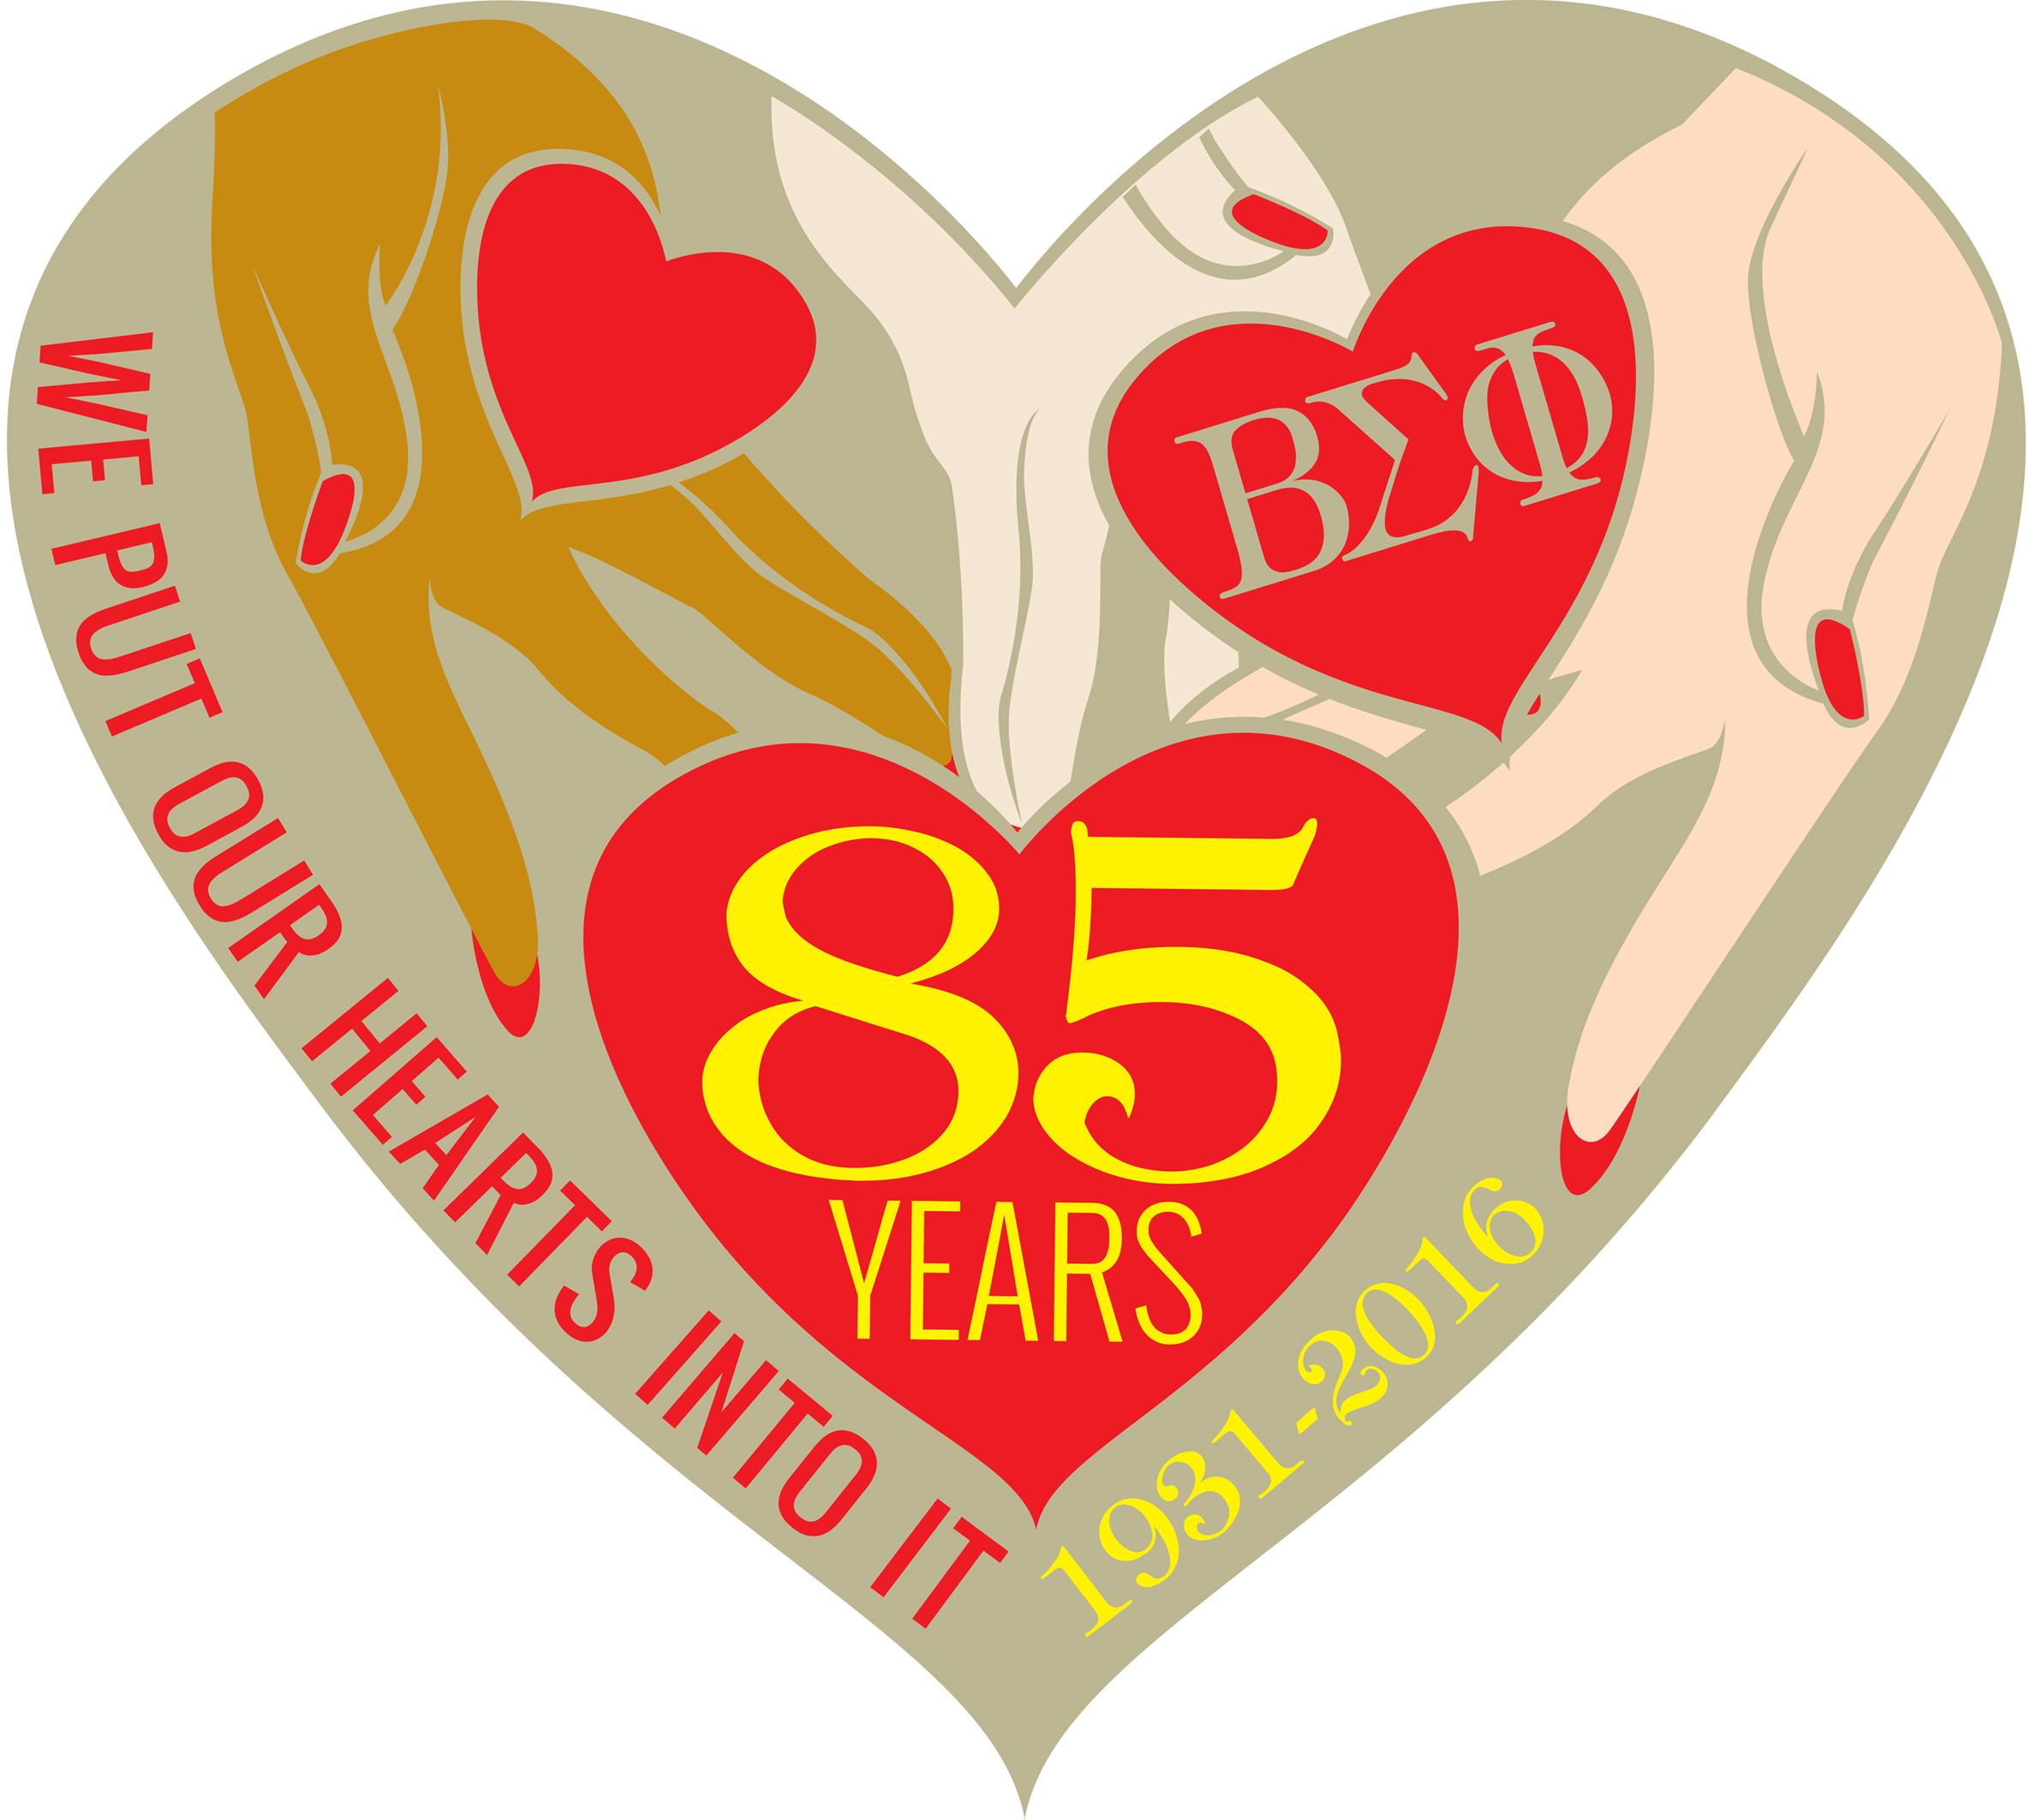 Beta Sigma Phi is an Internat